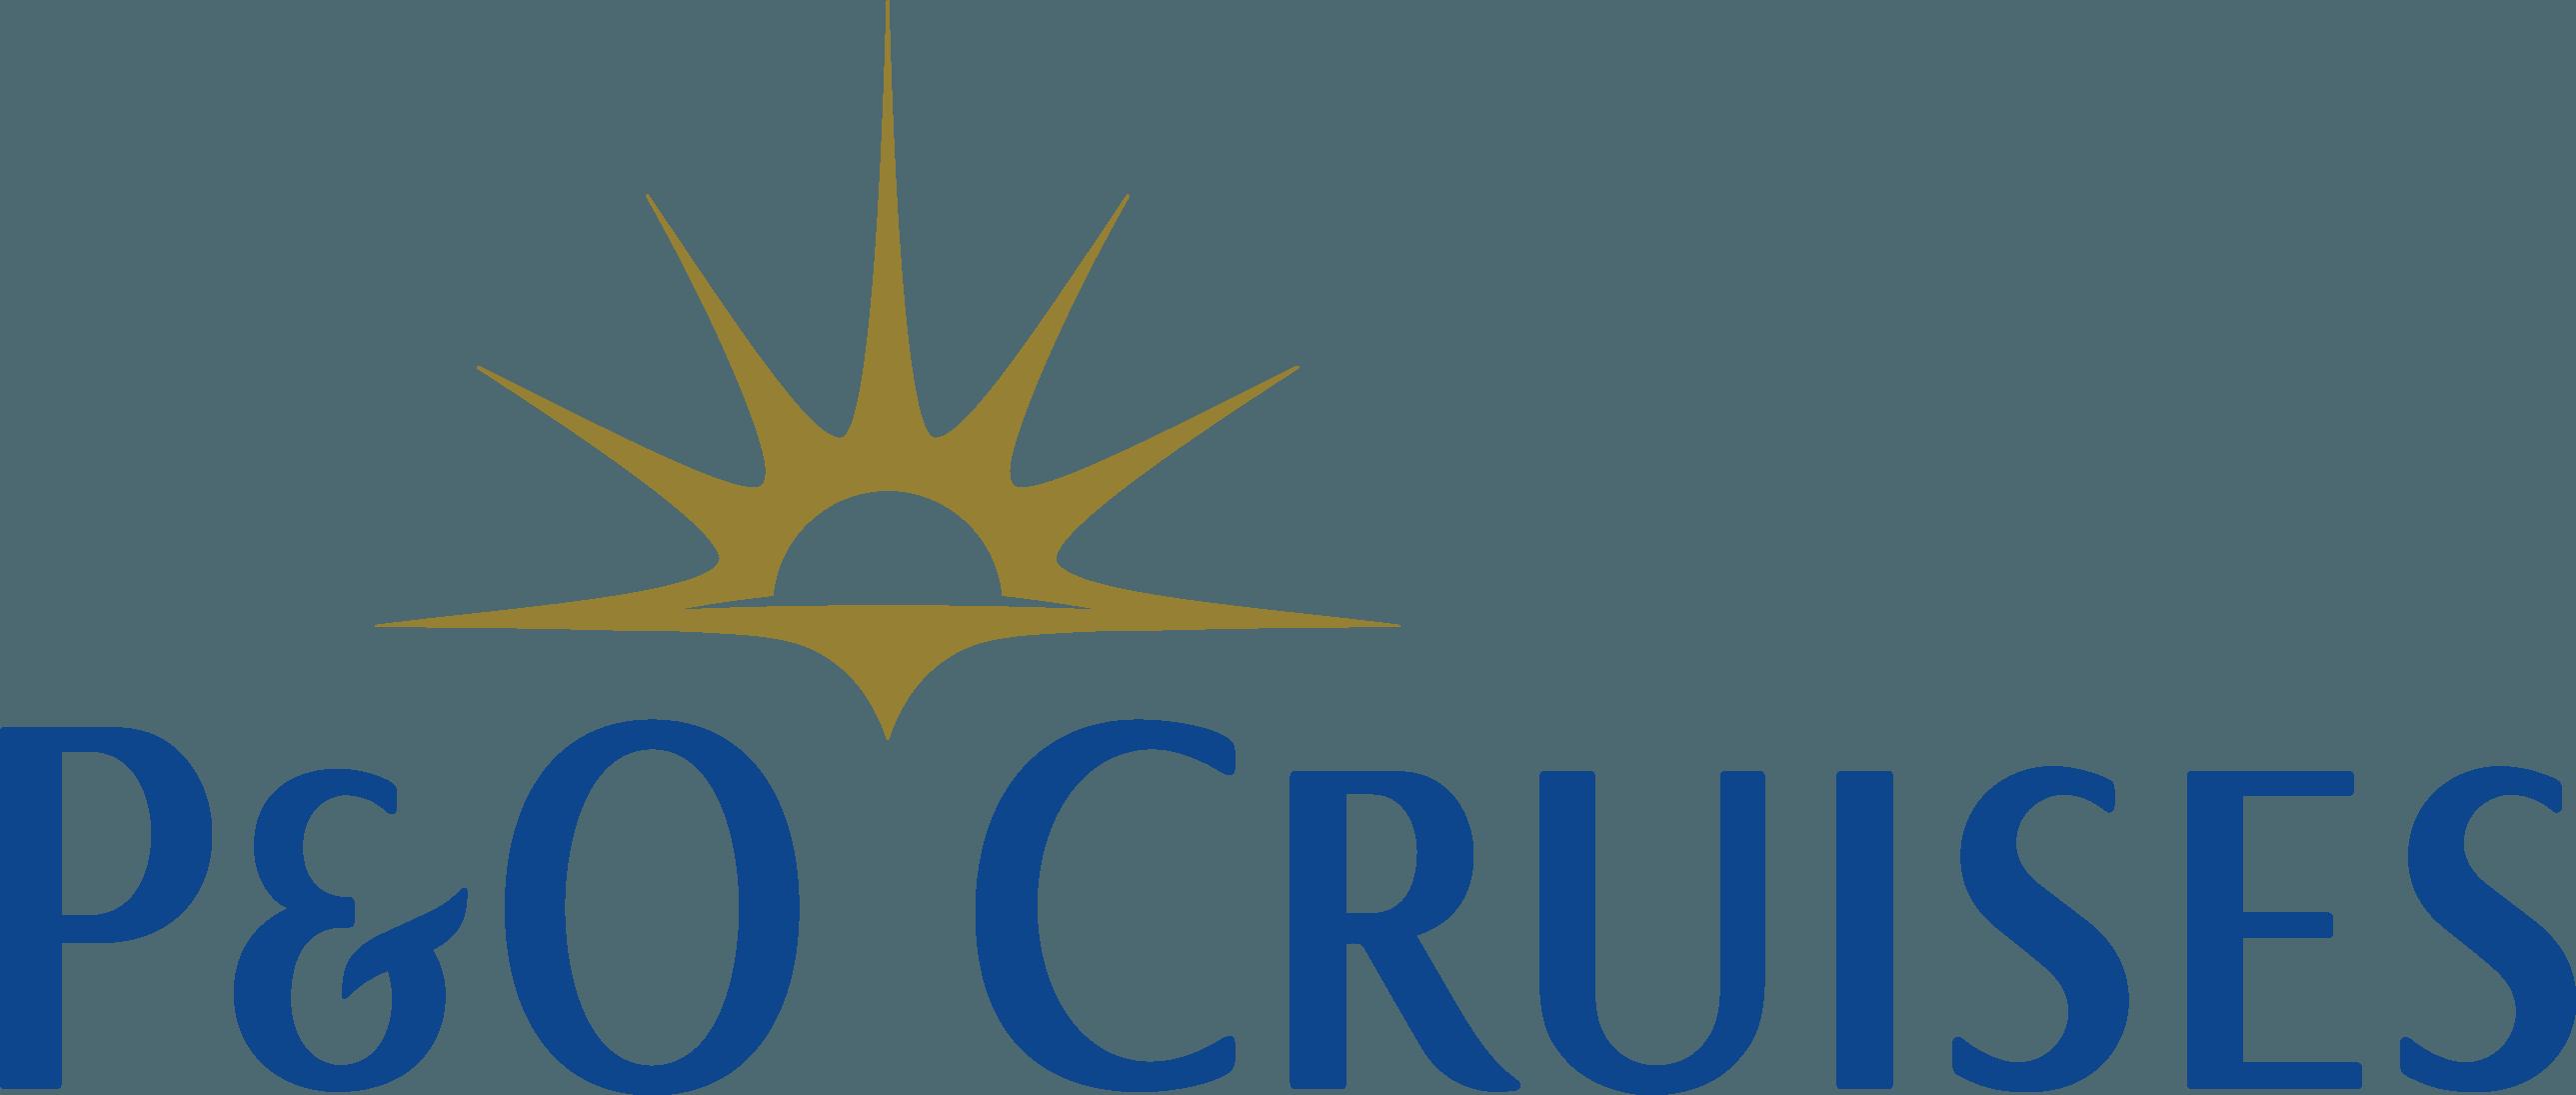 P&O Cruises Logo png